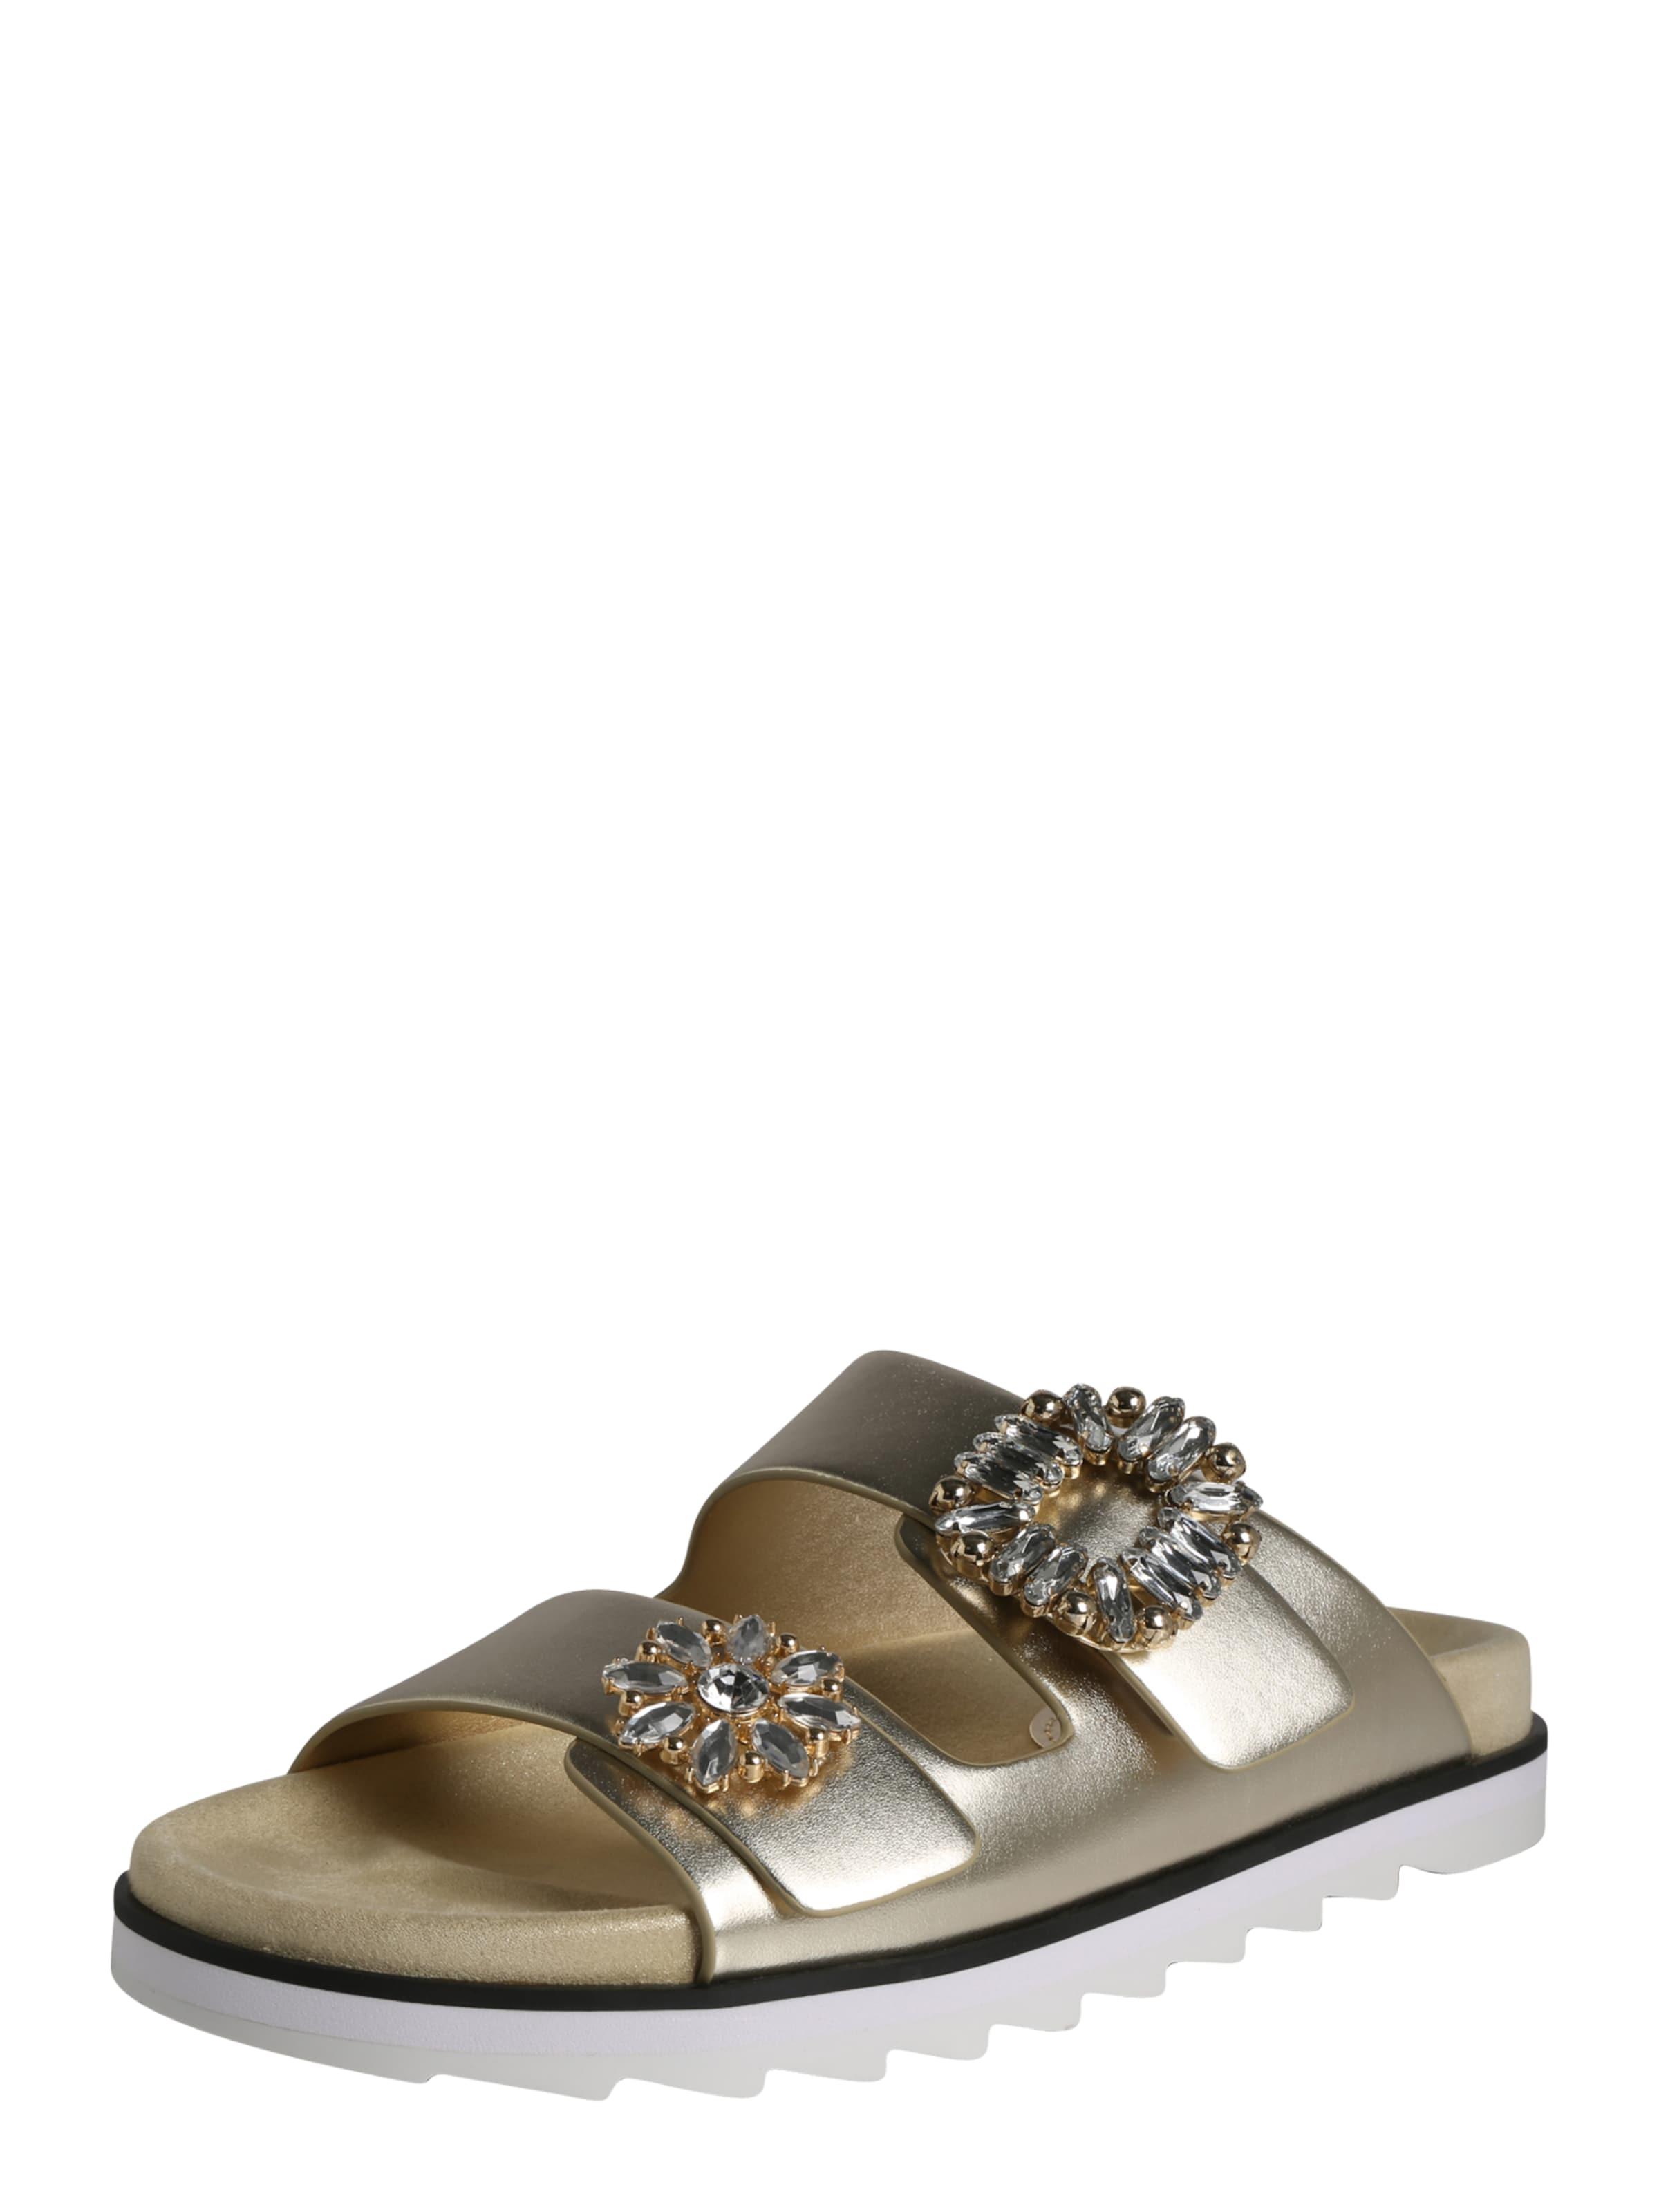 GUESS Sandale Cambrie Verschleißfeste billige Schuhe